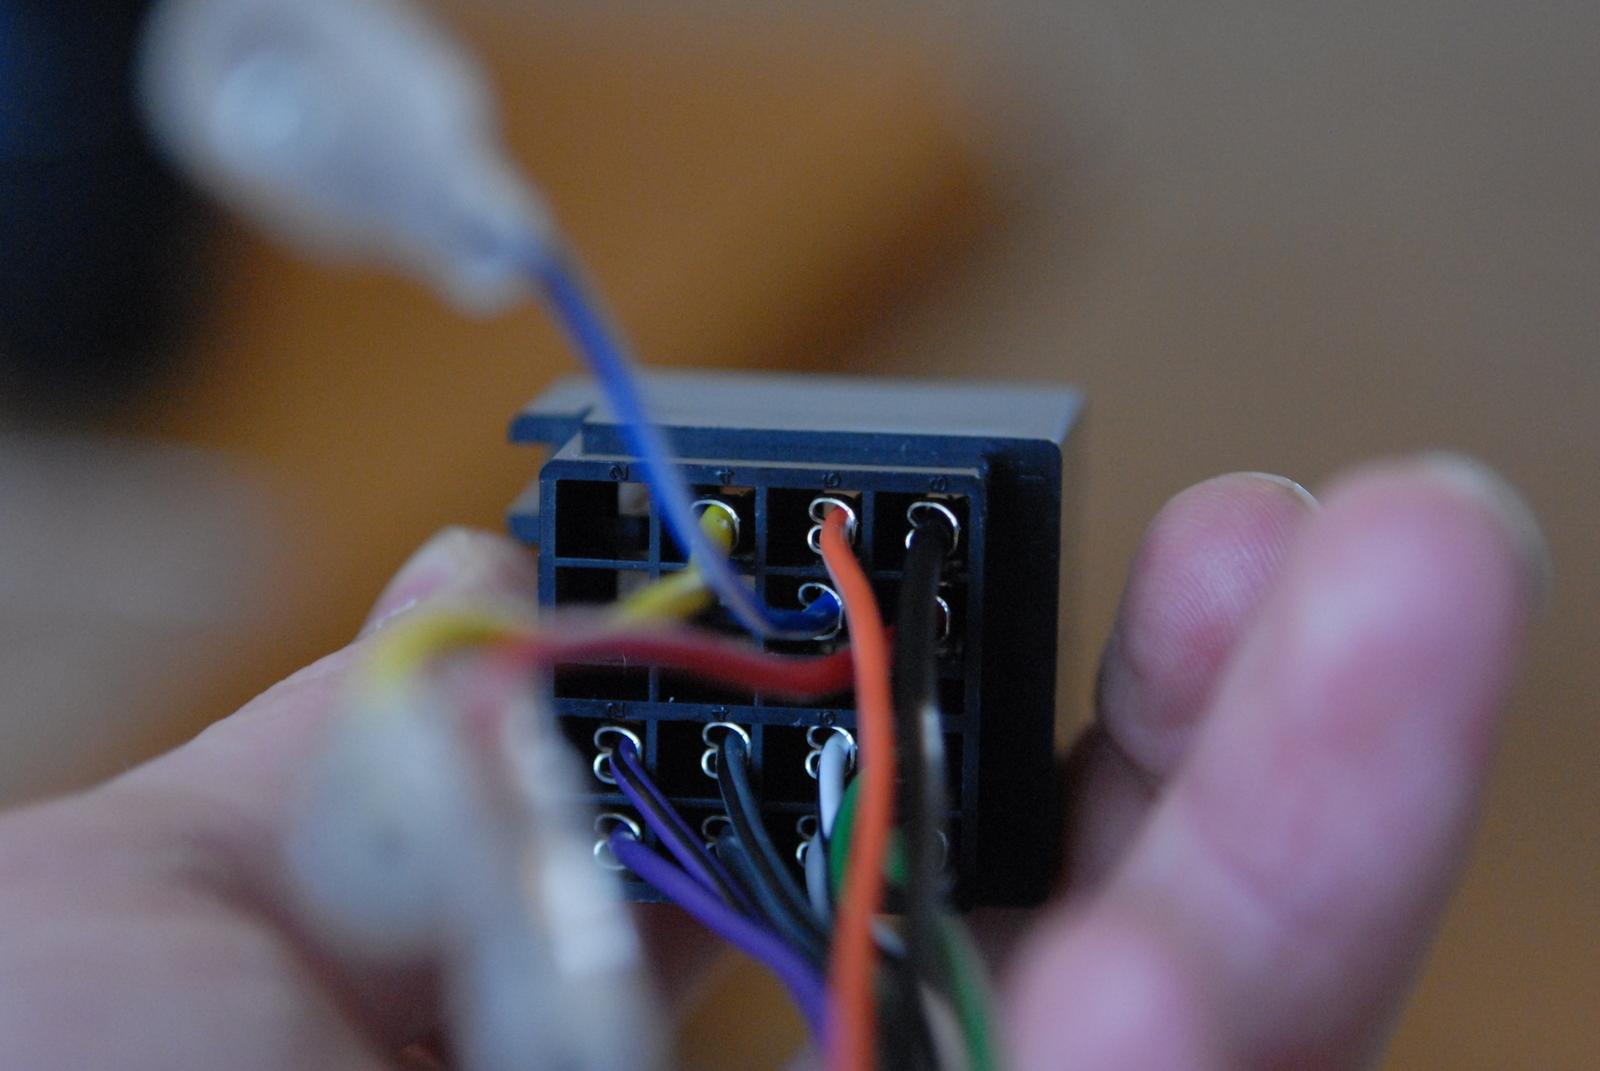 fiat punto wiring diagram mk1 images fiat punto mk3 radio wiring diagram general punto subwoofer help the